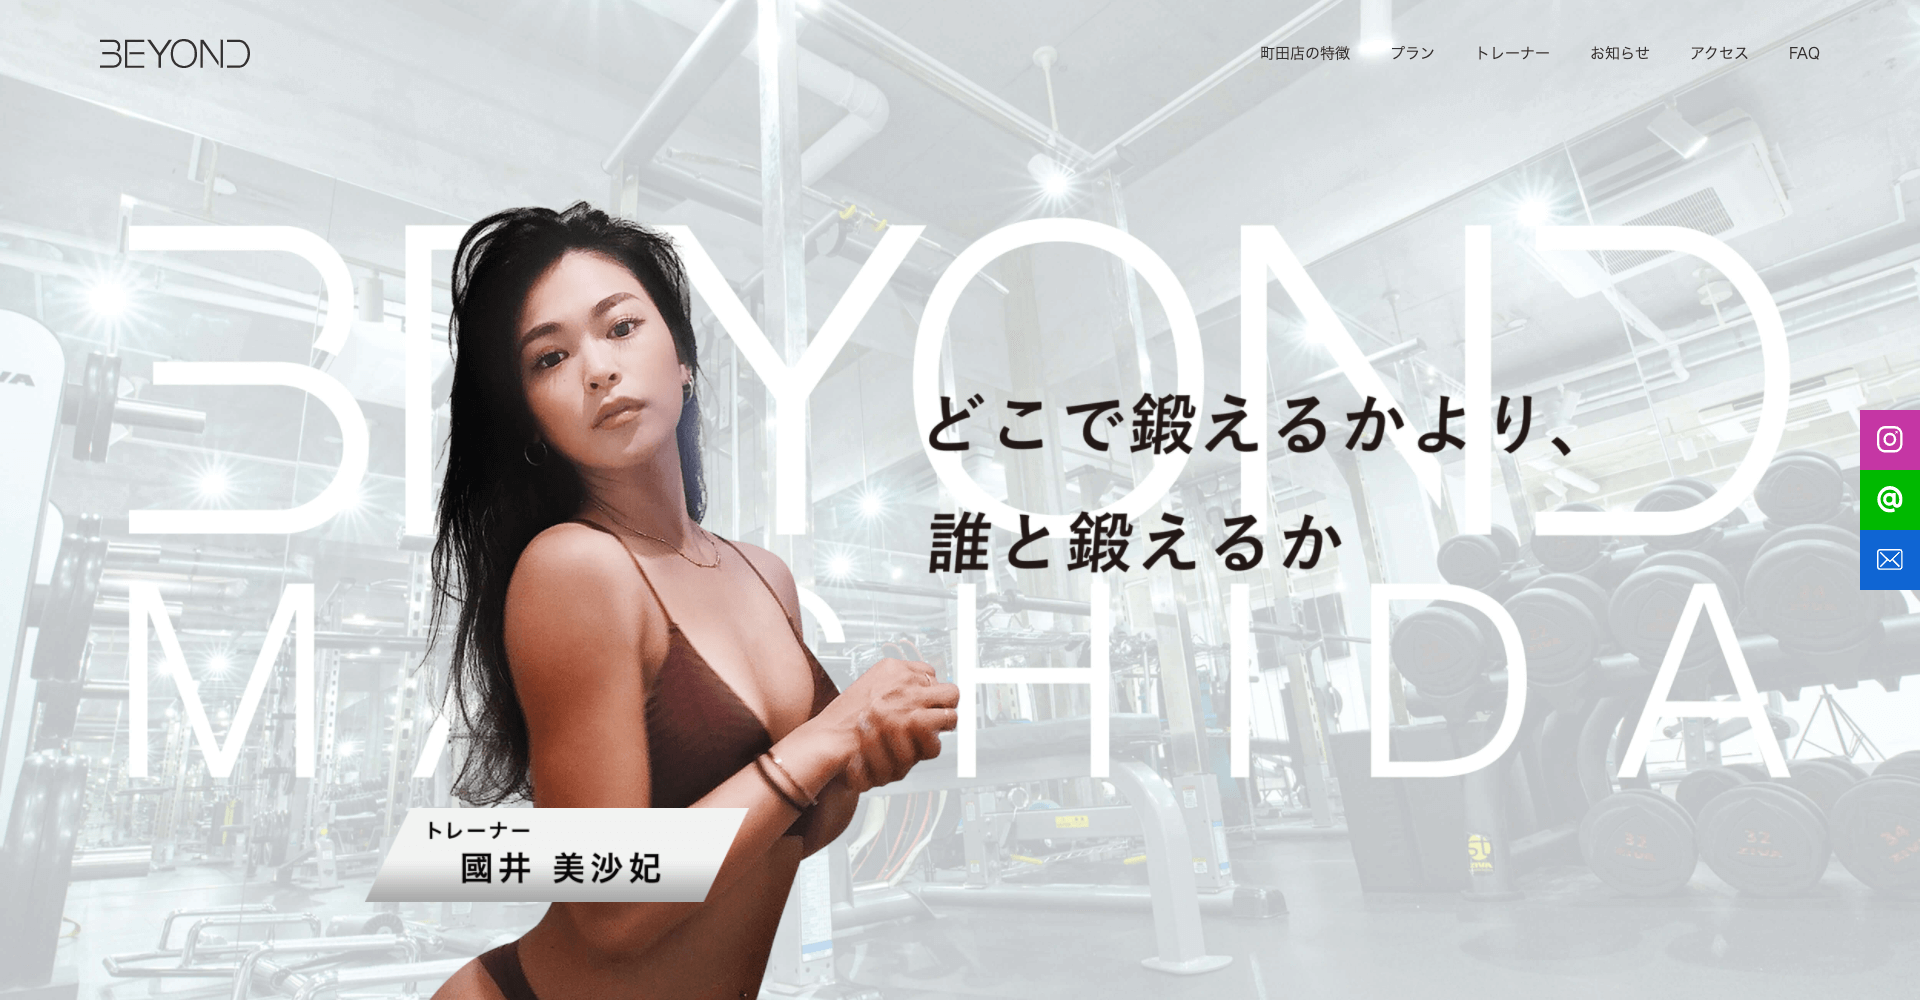 BEYOND(ビヨンド)ジム 町田店